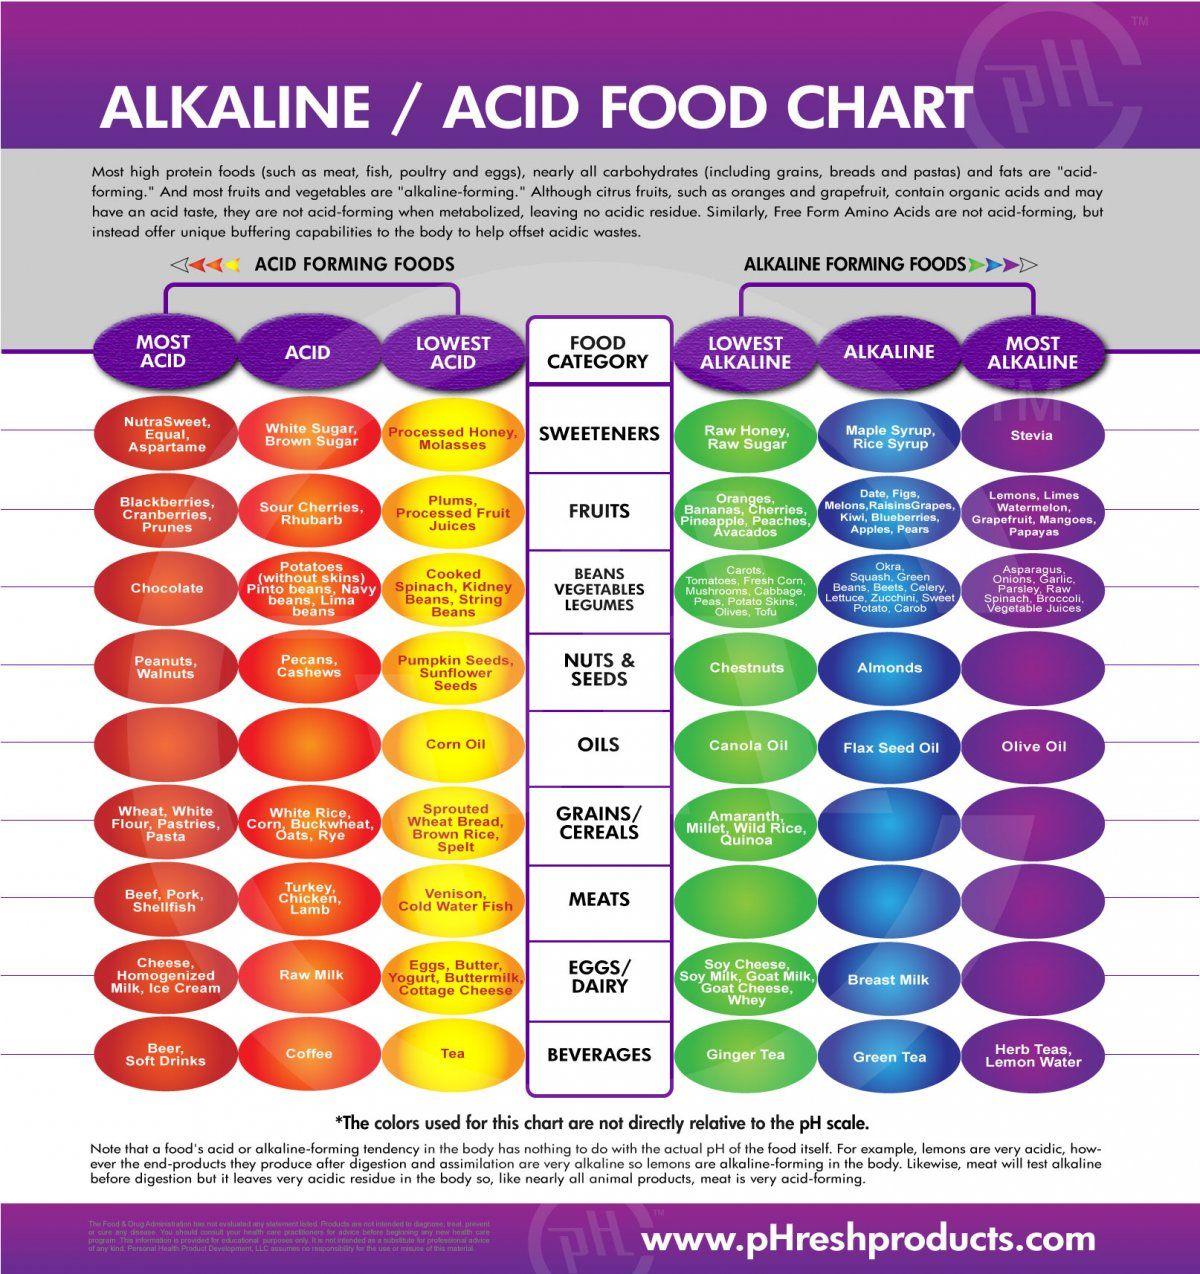 Alkaline acid food chart alkalize or die pinterest alkaline